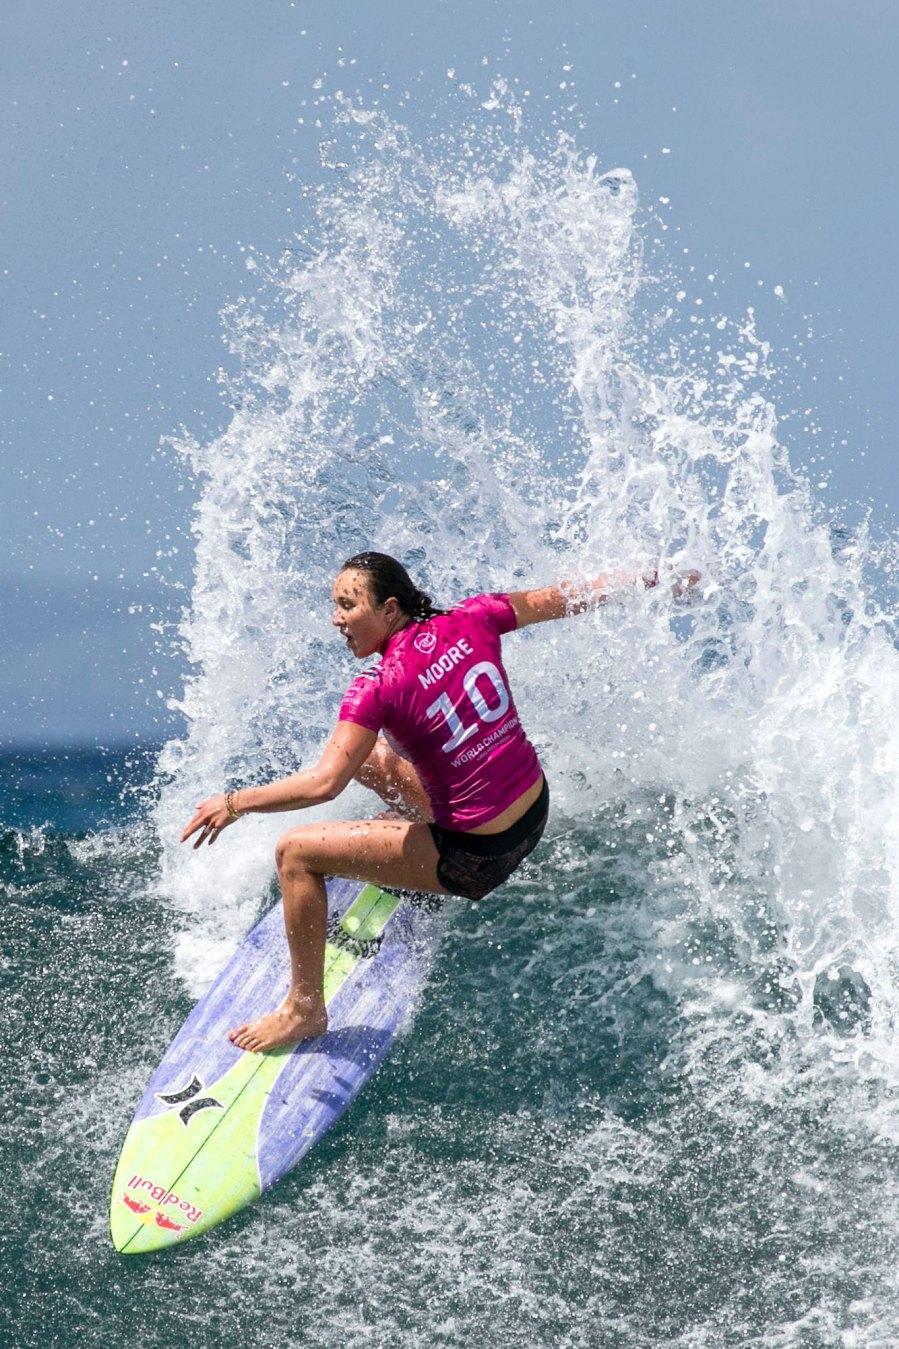 Carissa Moore Team USA Competing at Tokyo Olympics 2020